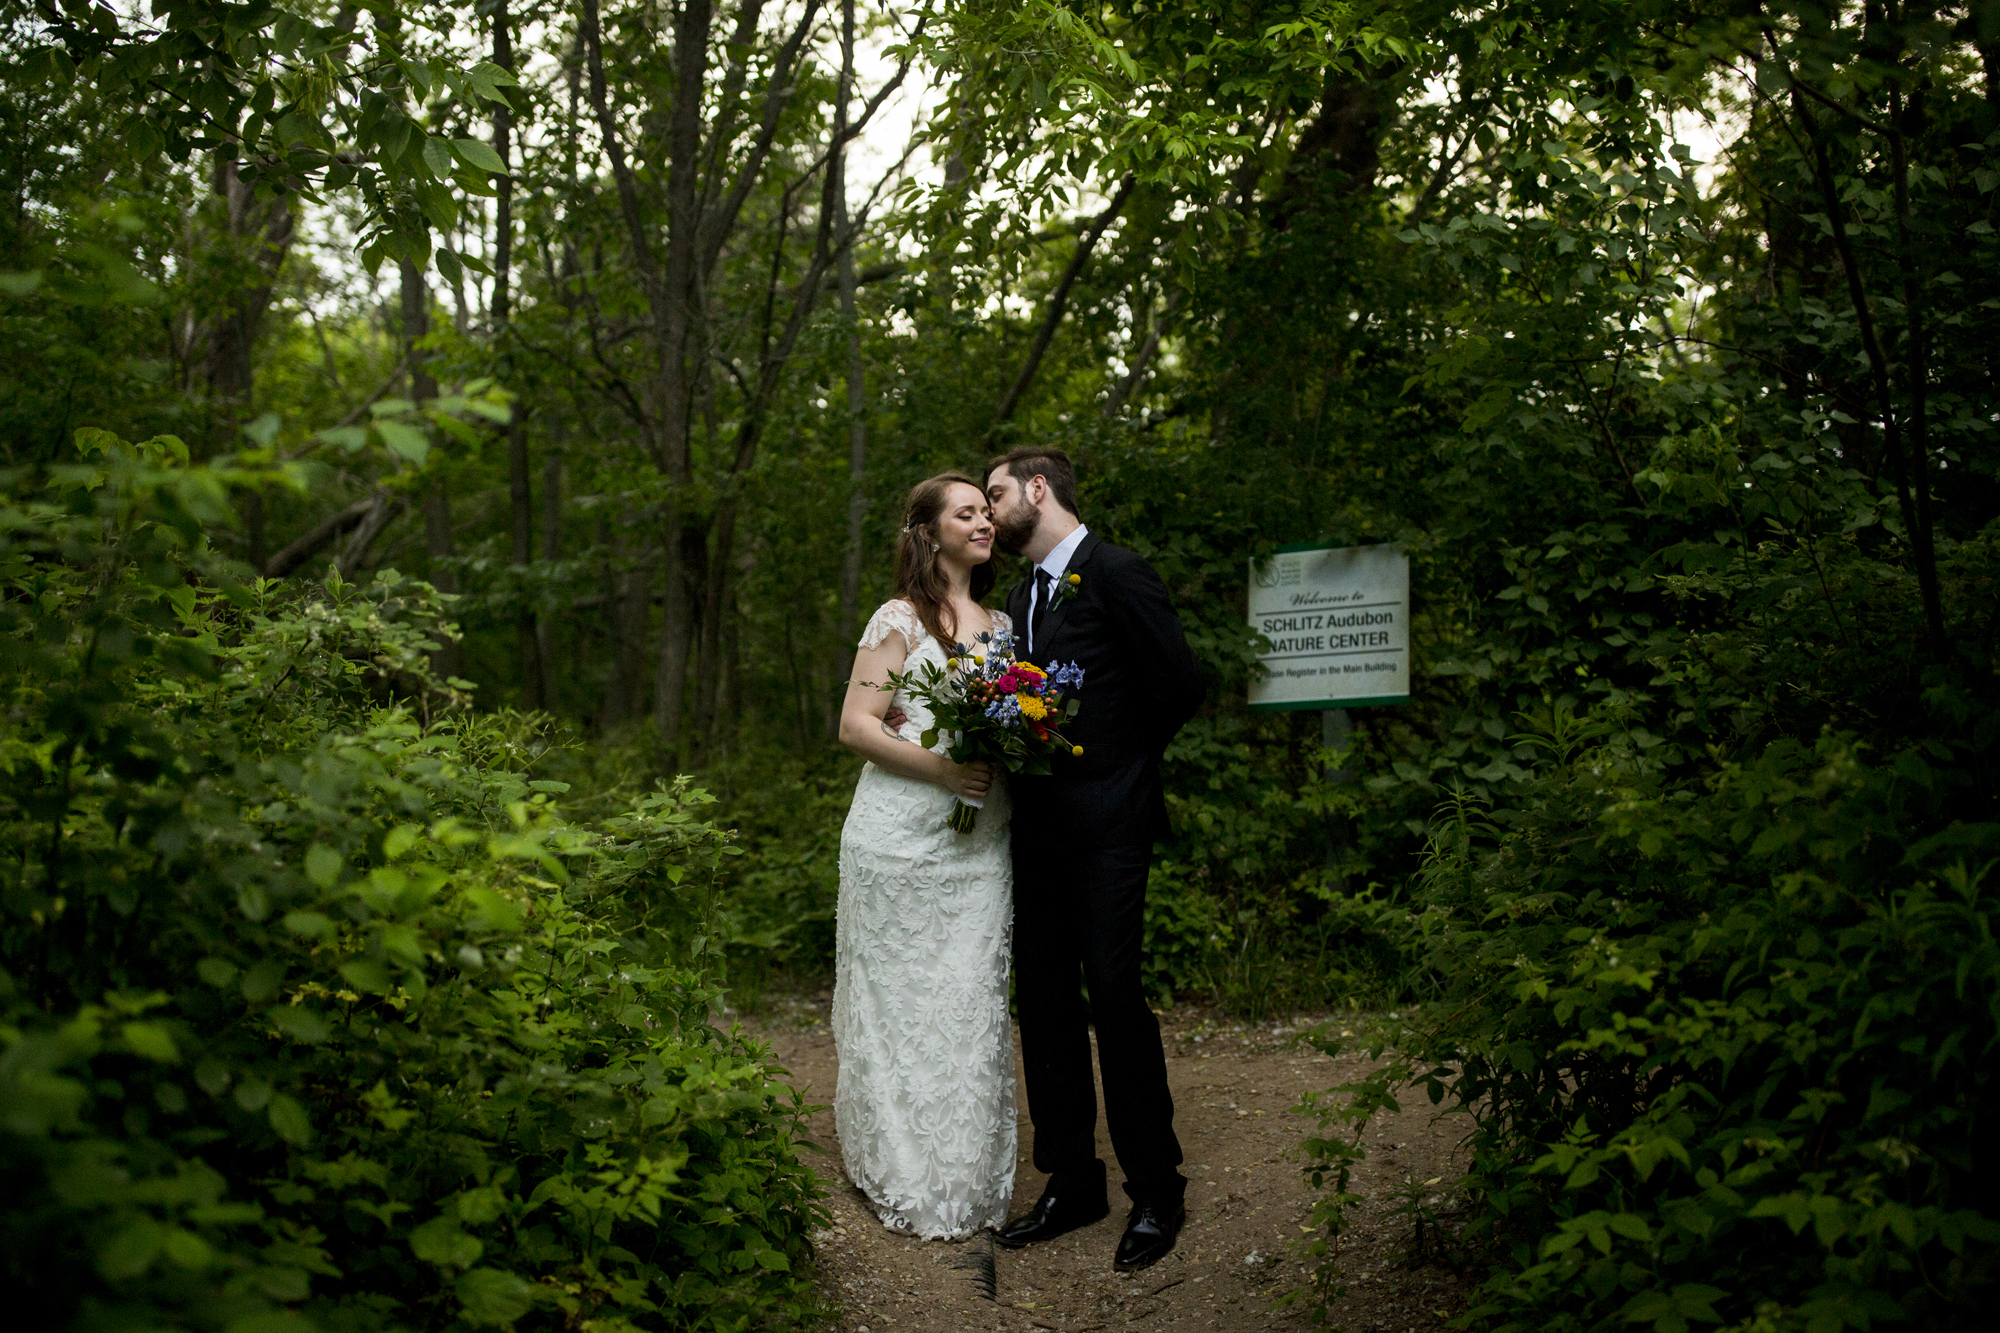 Seriously_Sabrina_Photography_Milwaukee_Wisconsin_Wedding_Schlitz_Audubon_Nature_Center_BrunderRife123.jpg